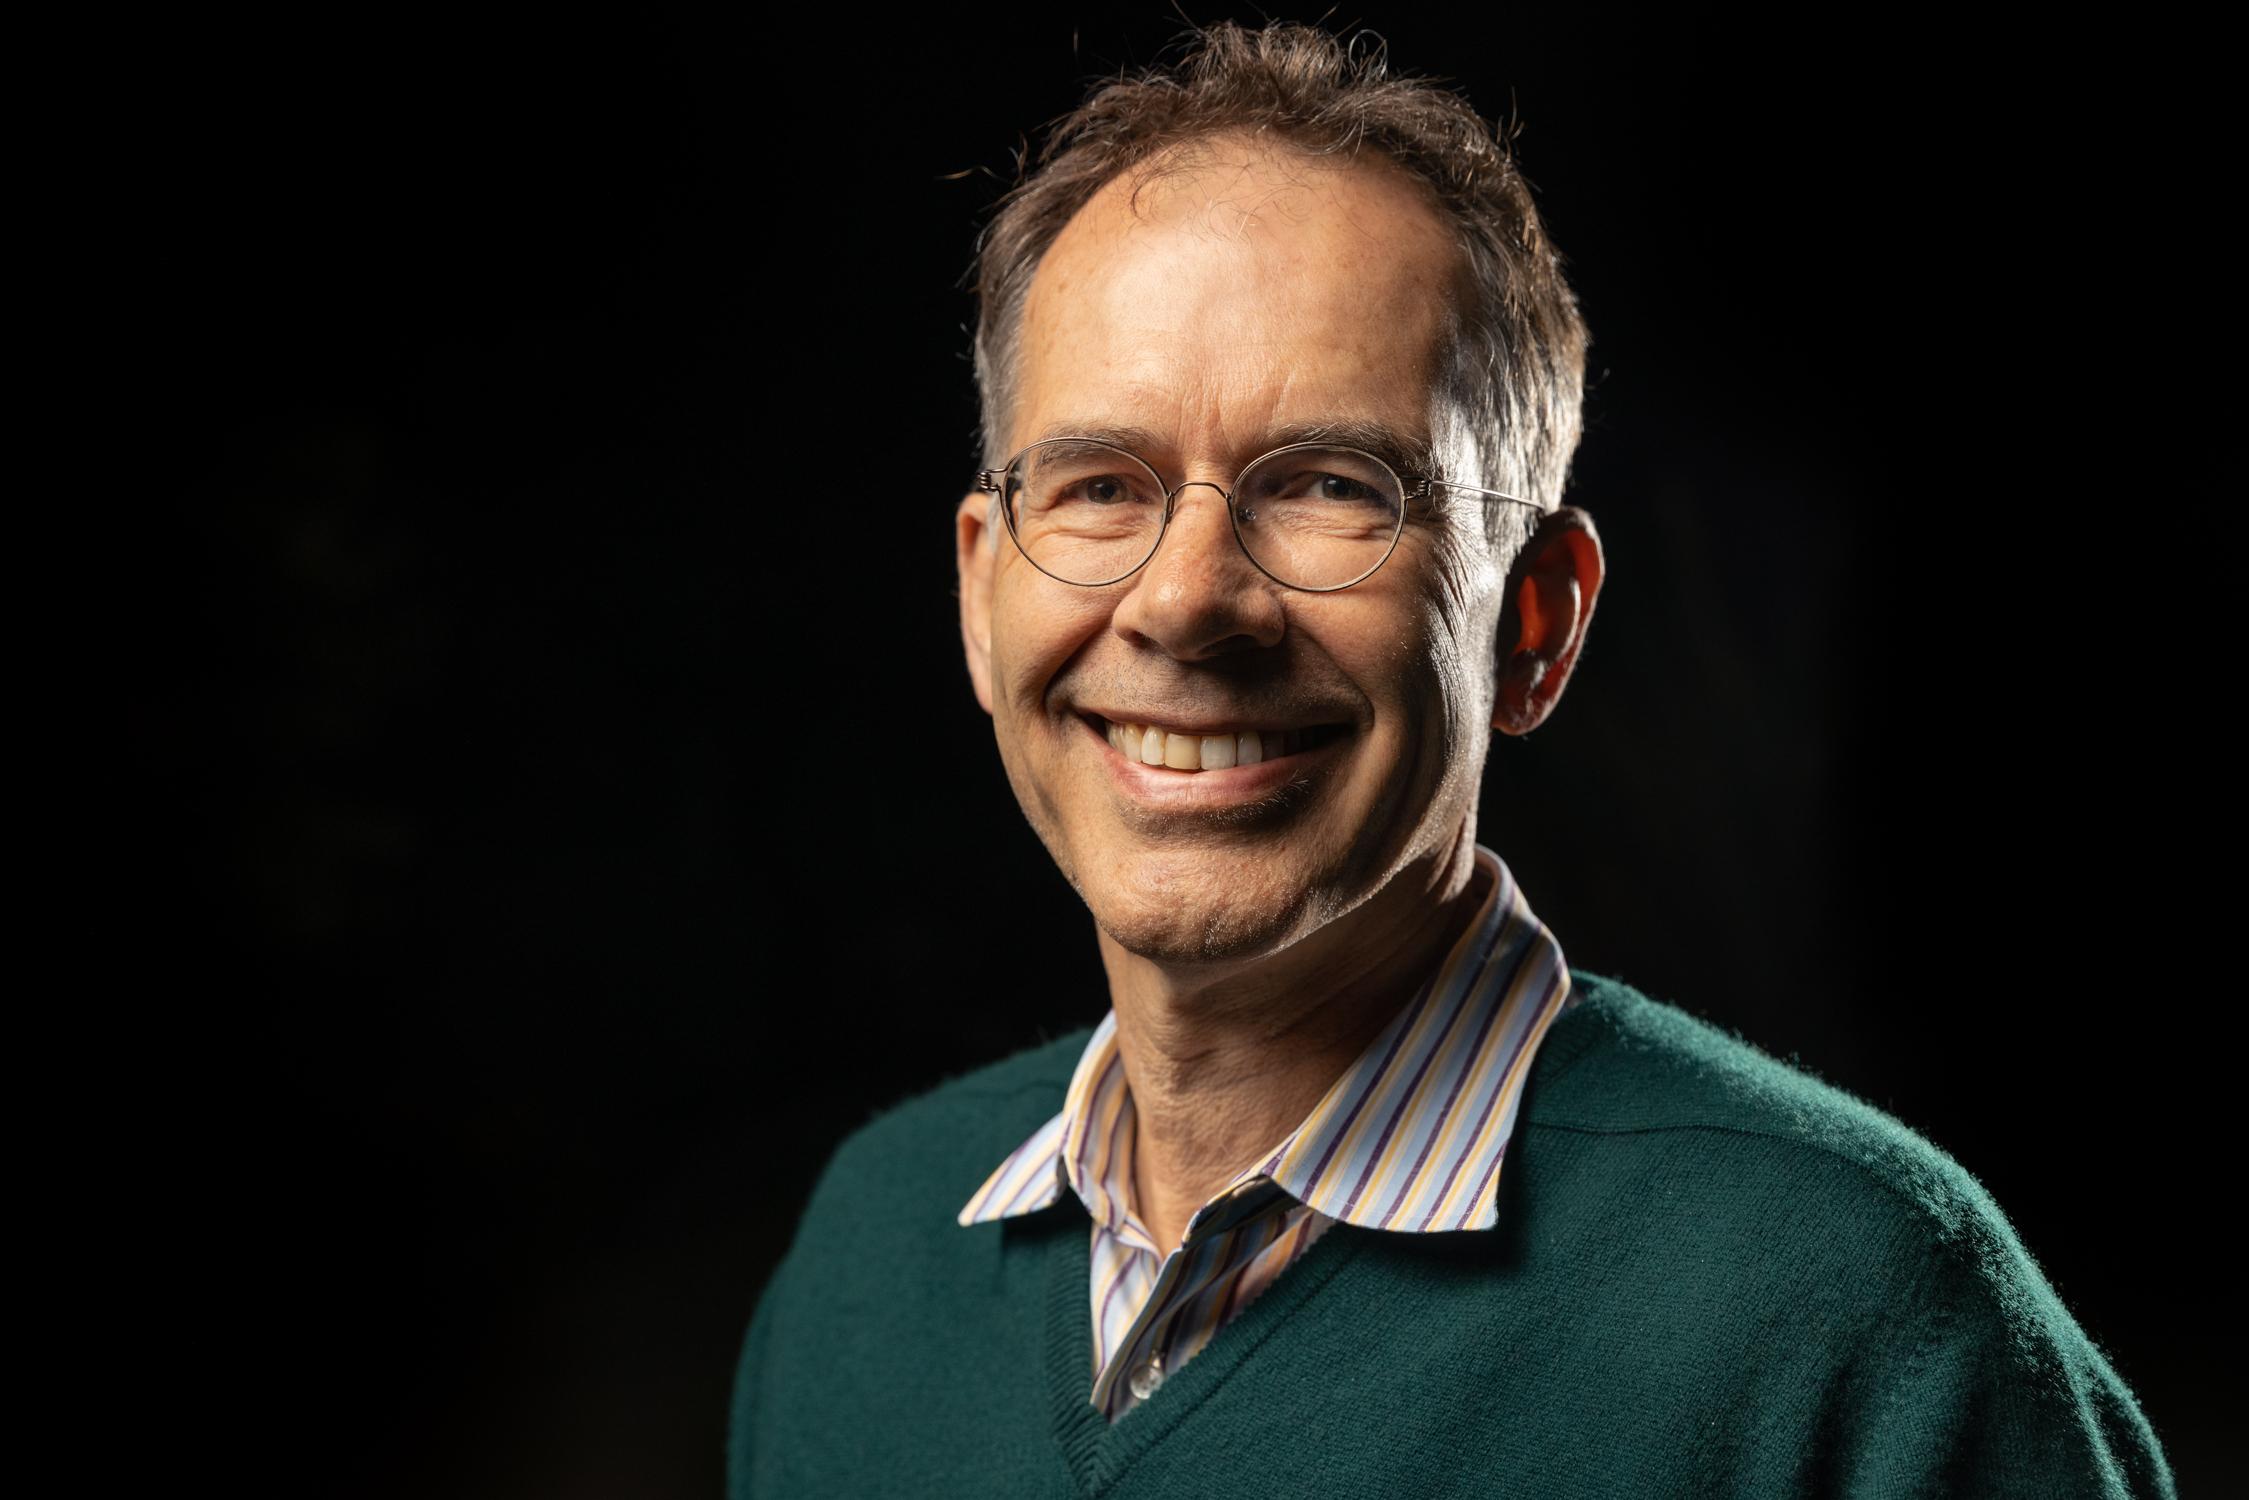 A headshot of Stanford economics professor Guido Imbens